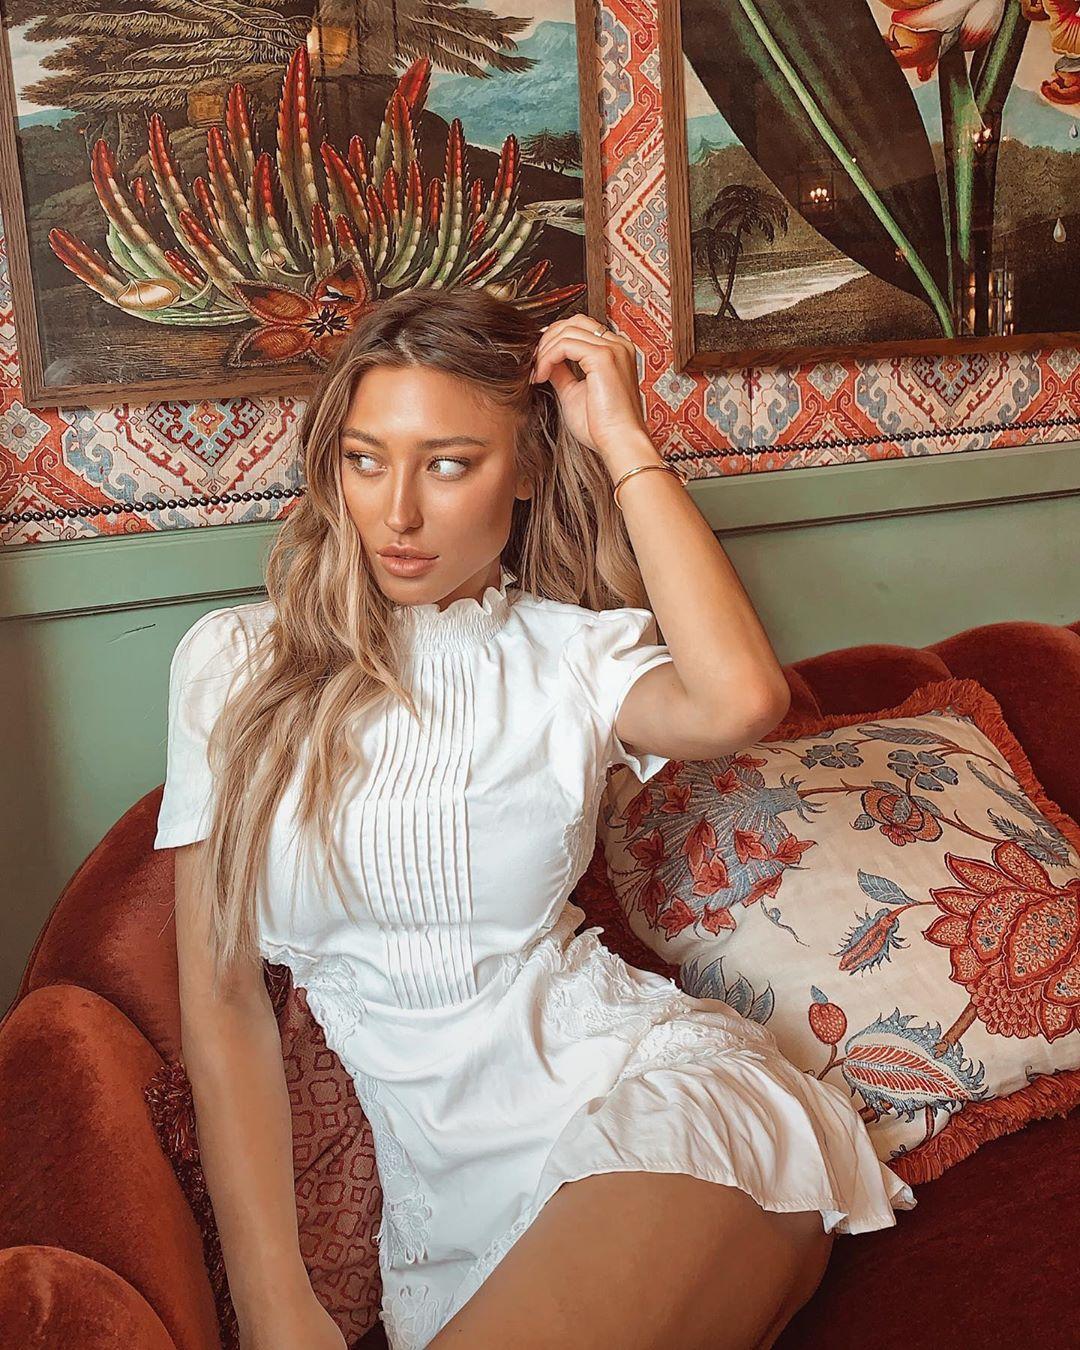 Stefanie-Gurzansk-Wallpapers-Insta-Fit-Bio-4